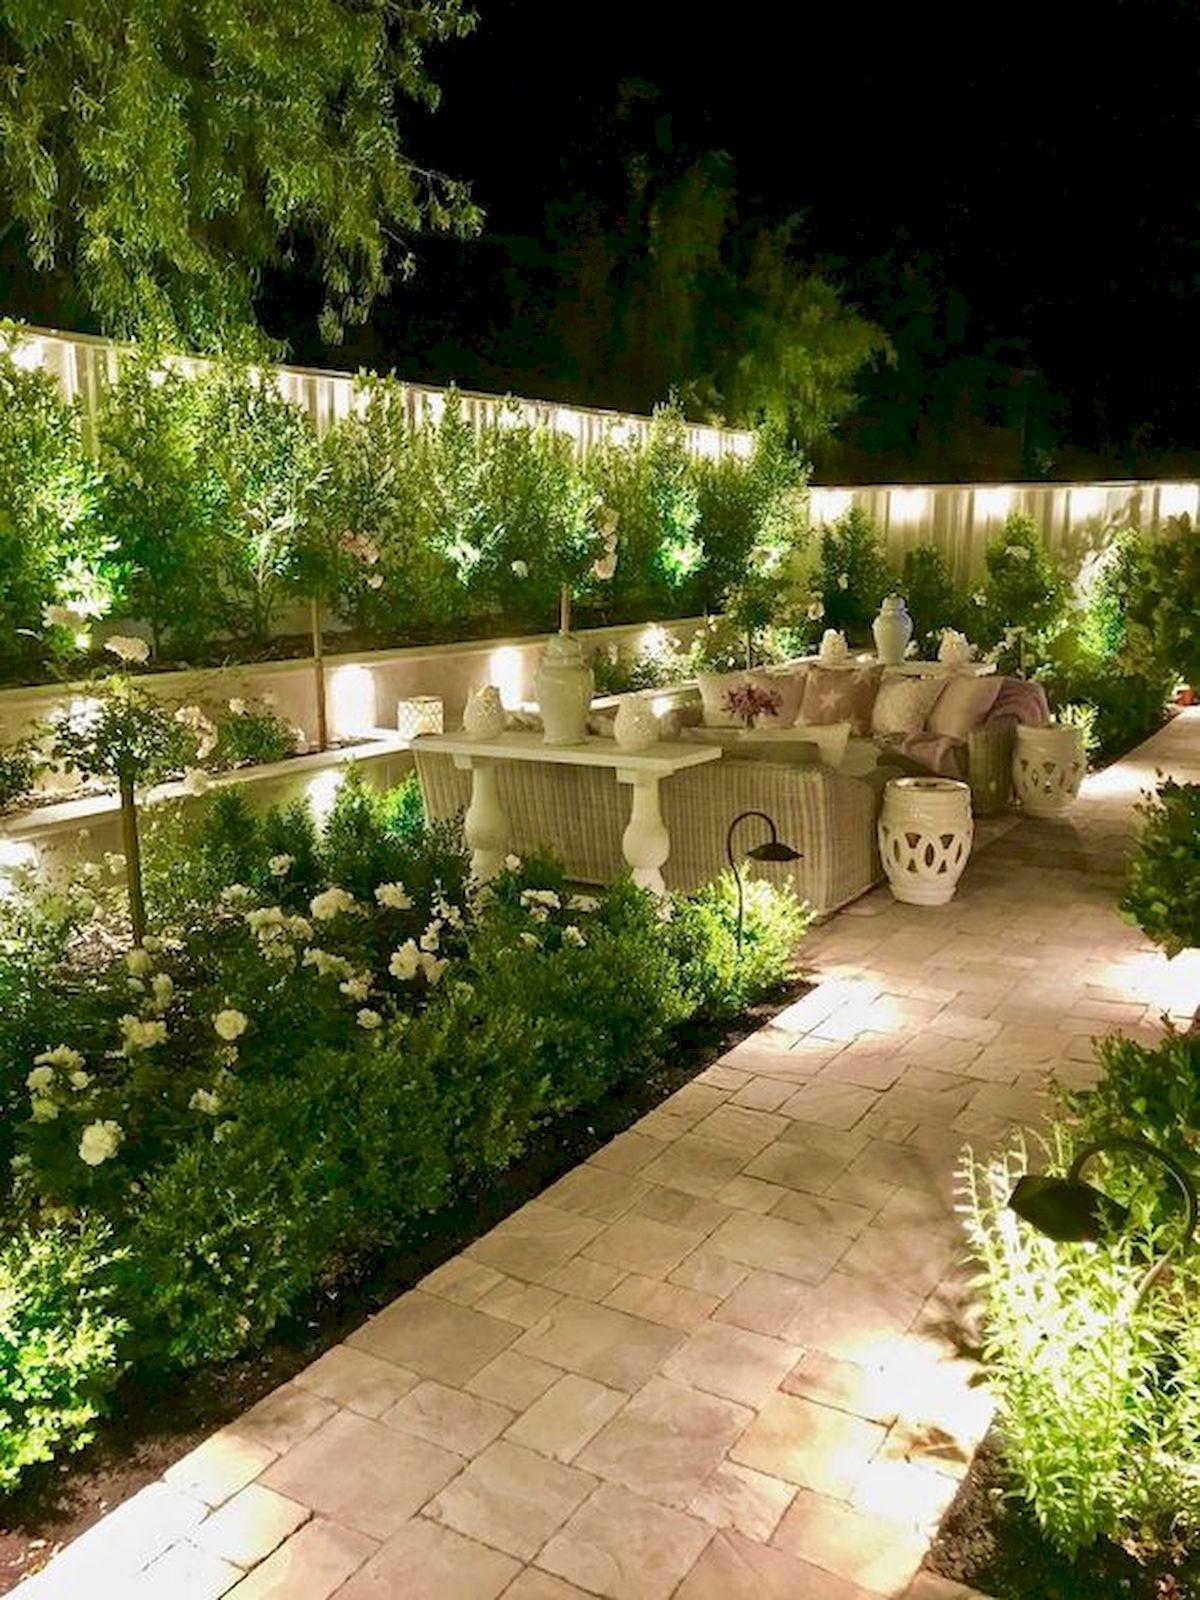 50 Awesome DIY Hanging Plants Ideas For Modern Backyard Garden (47)